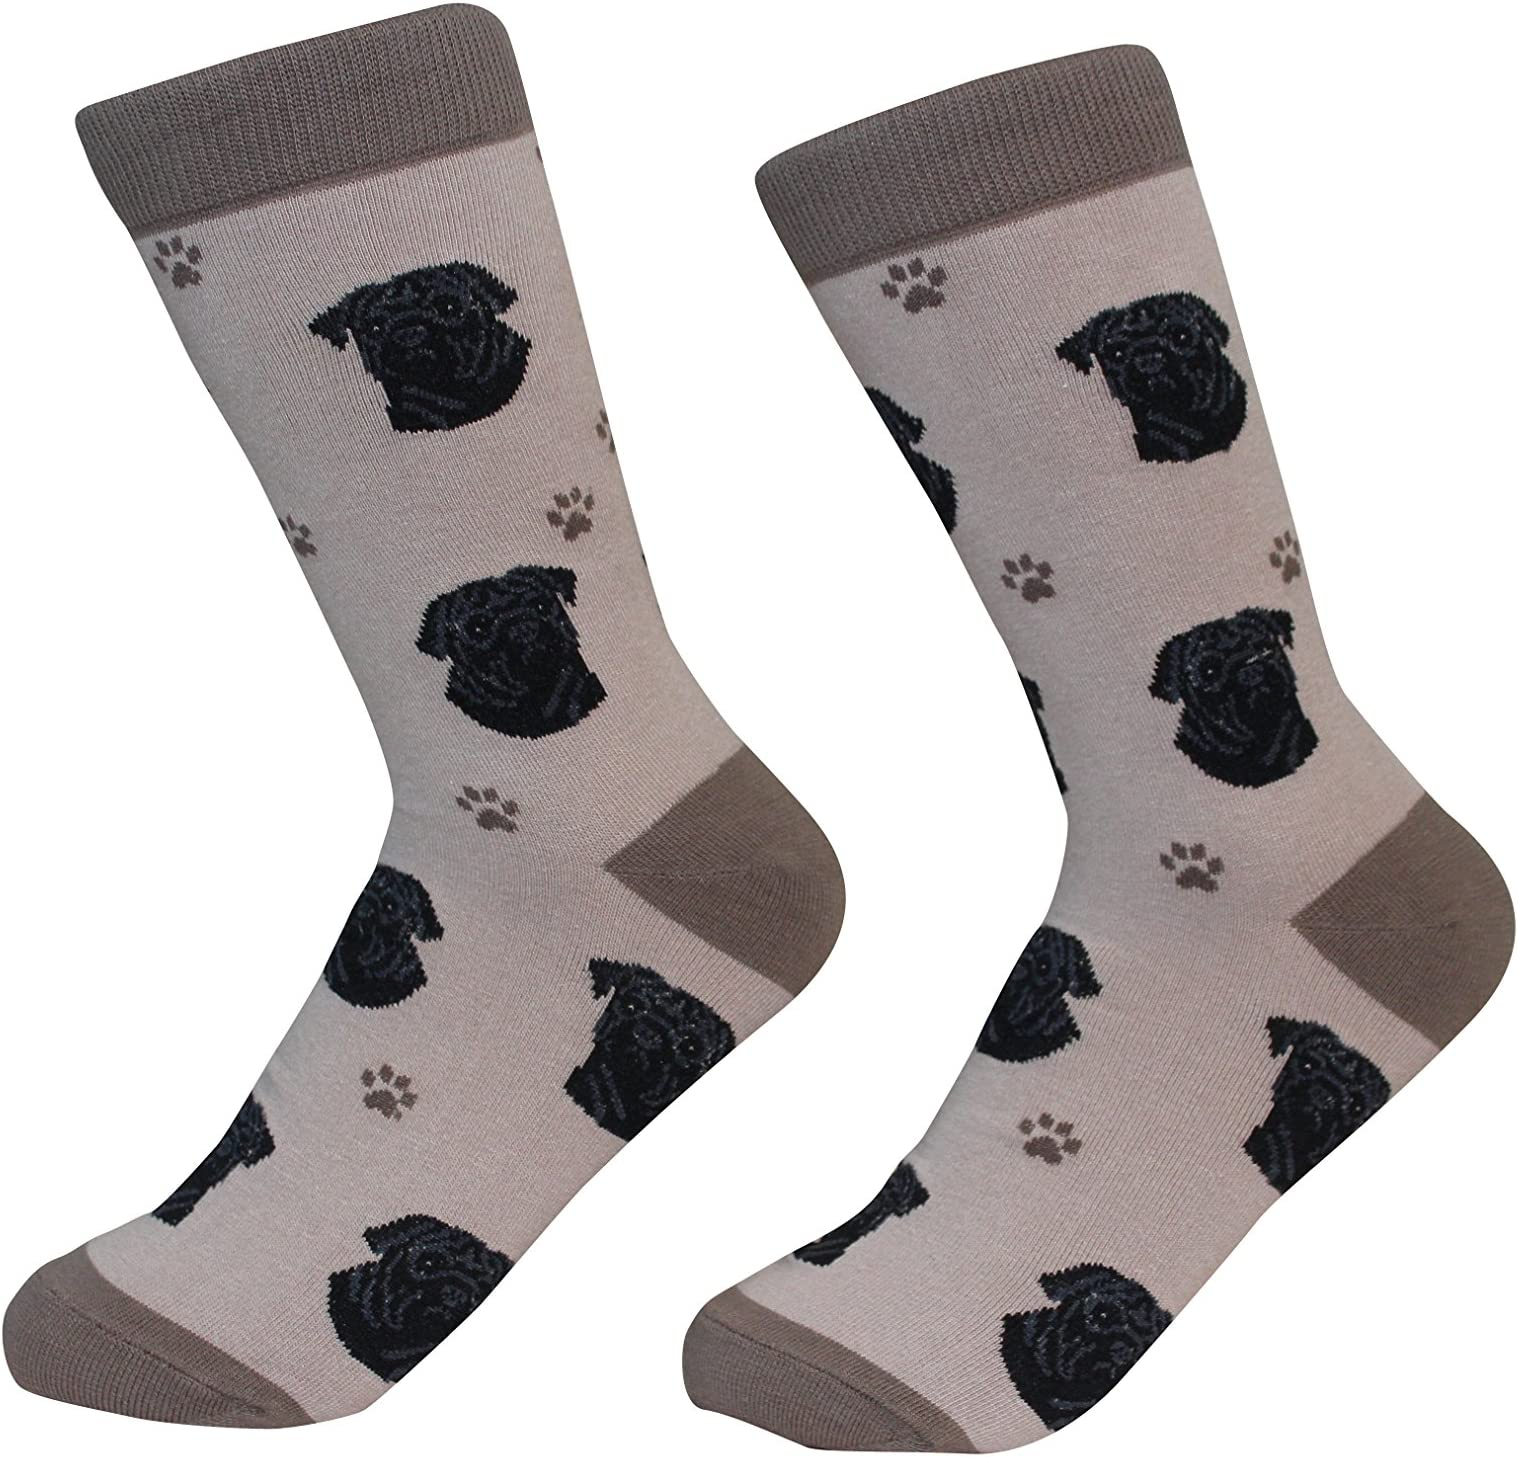 Custom Socks Trendy Socks, Gift Socks Unique Socks Dog Socks Funny Socks Cute Socks Pug Life Socks Pug Socks